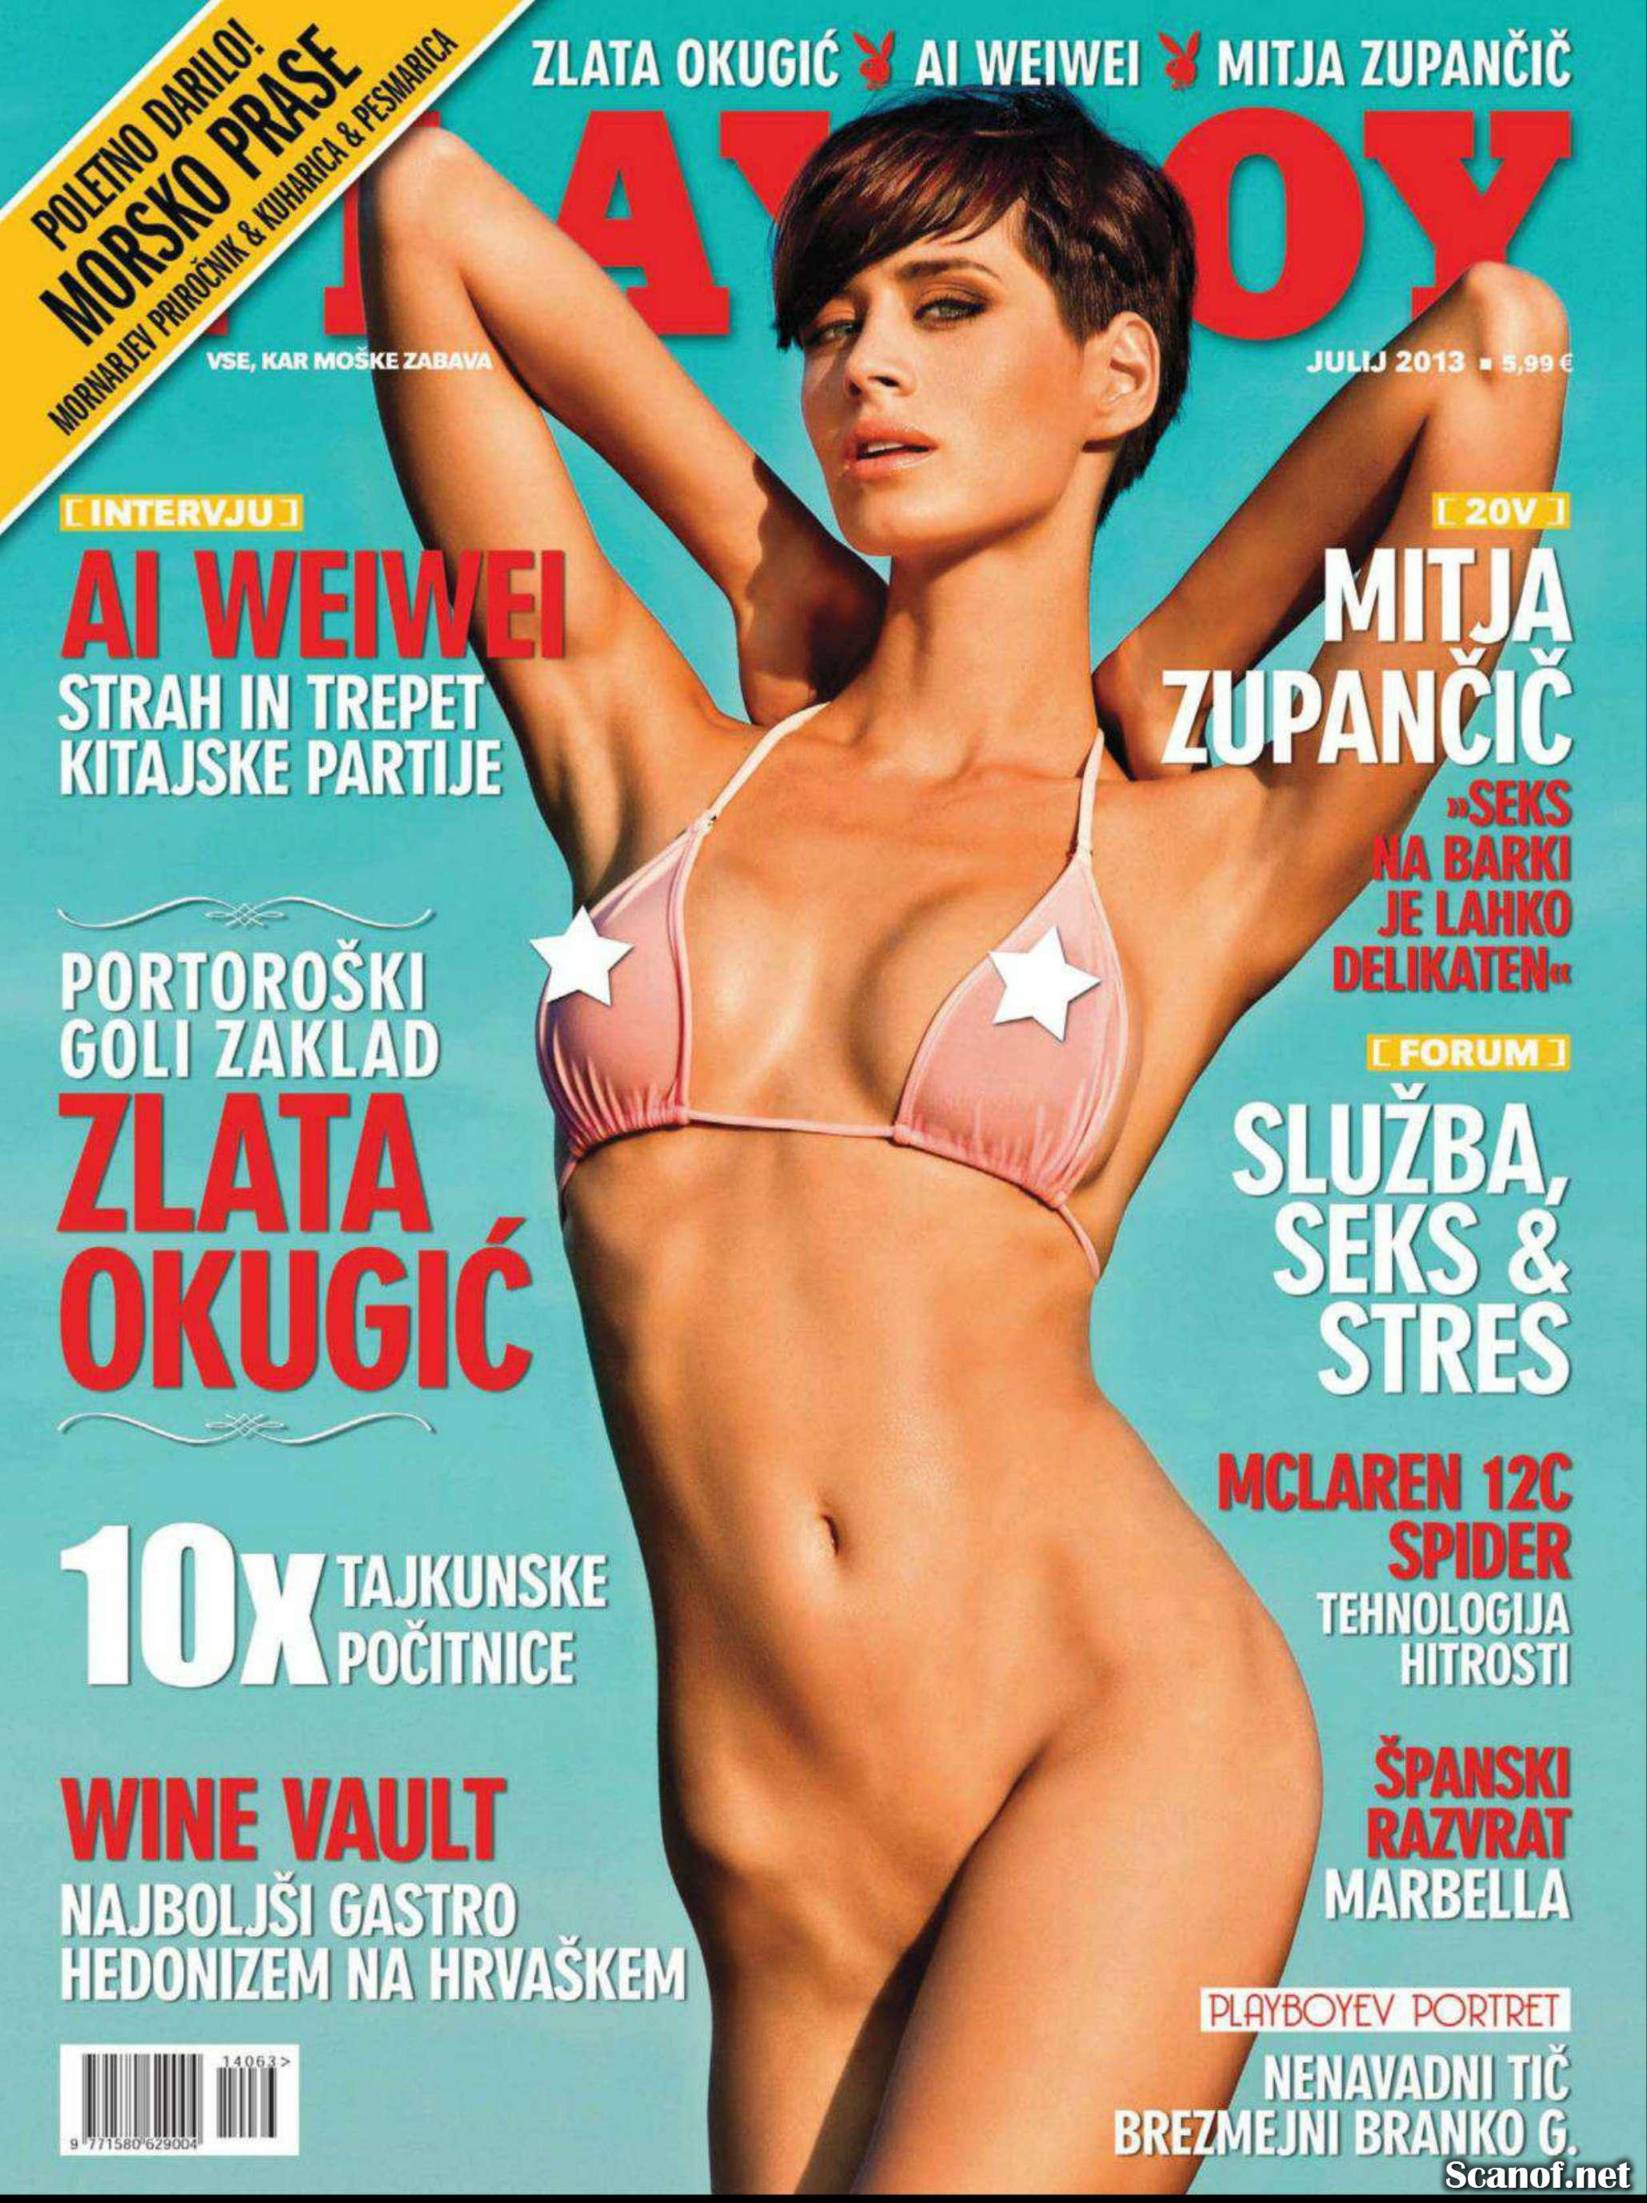 067122850_Playboy_2013_07_Slovenia_Scanof.net_001_123_68lo.jpg